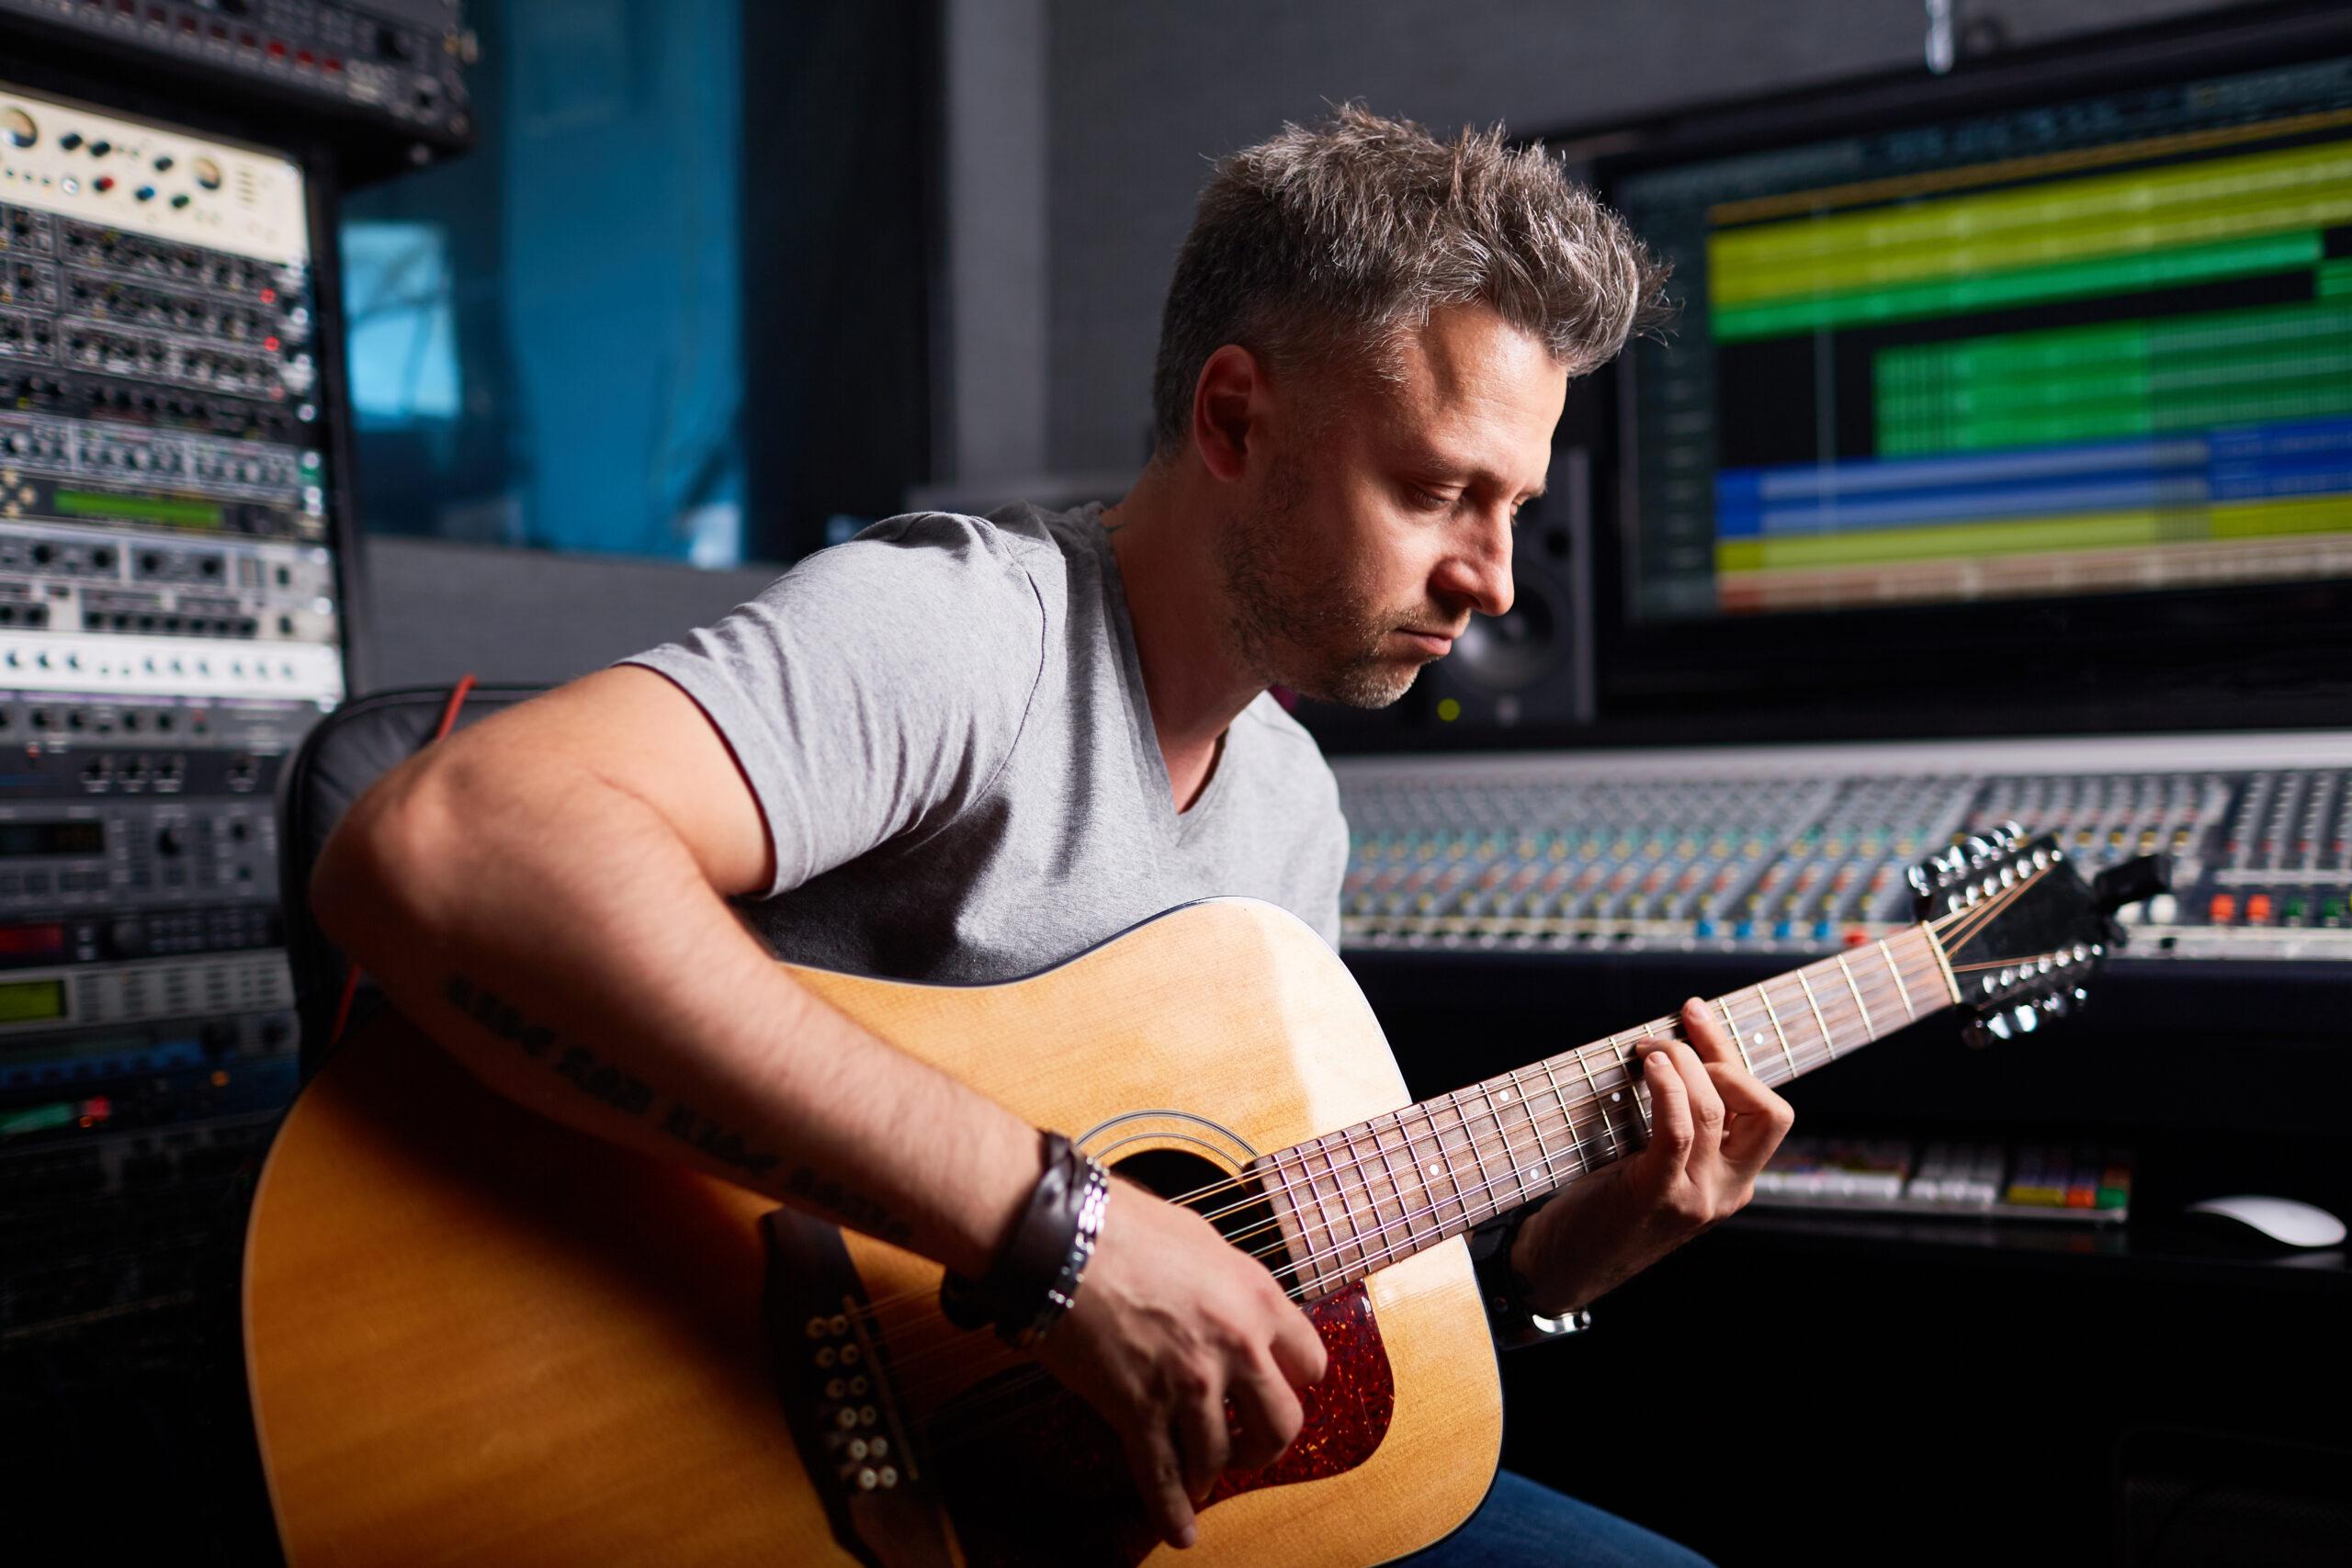 musician sitting in the studio